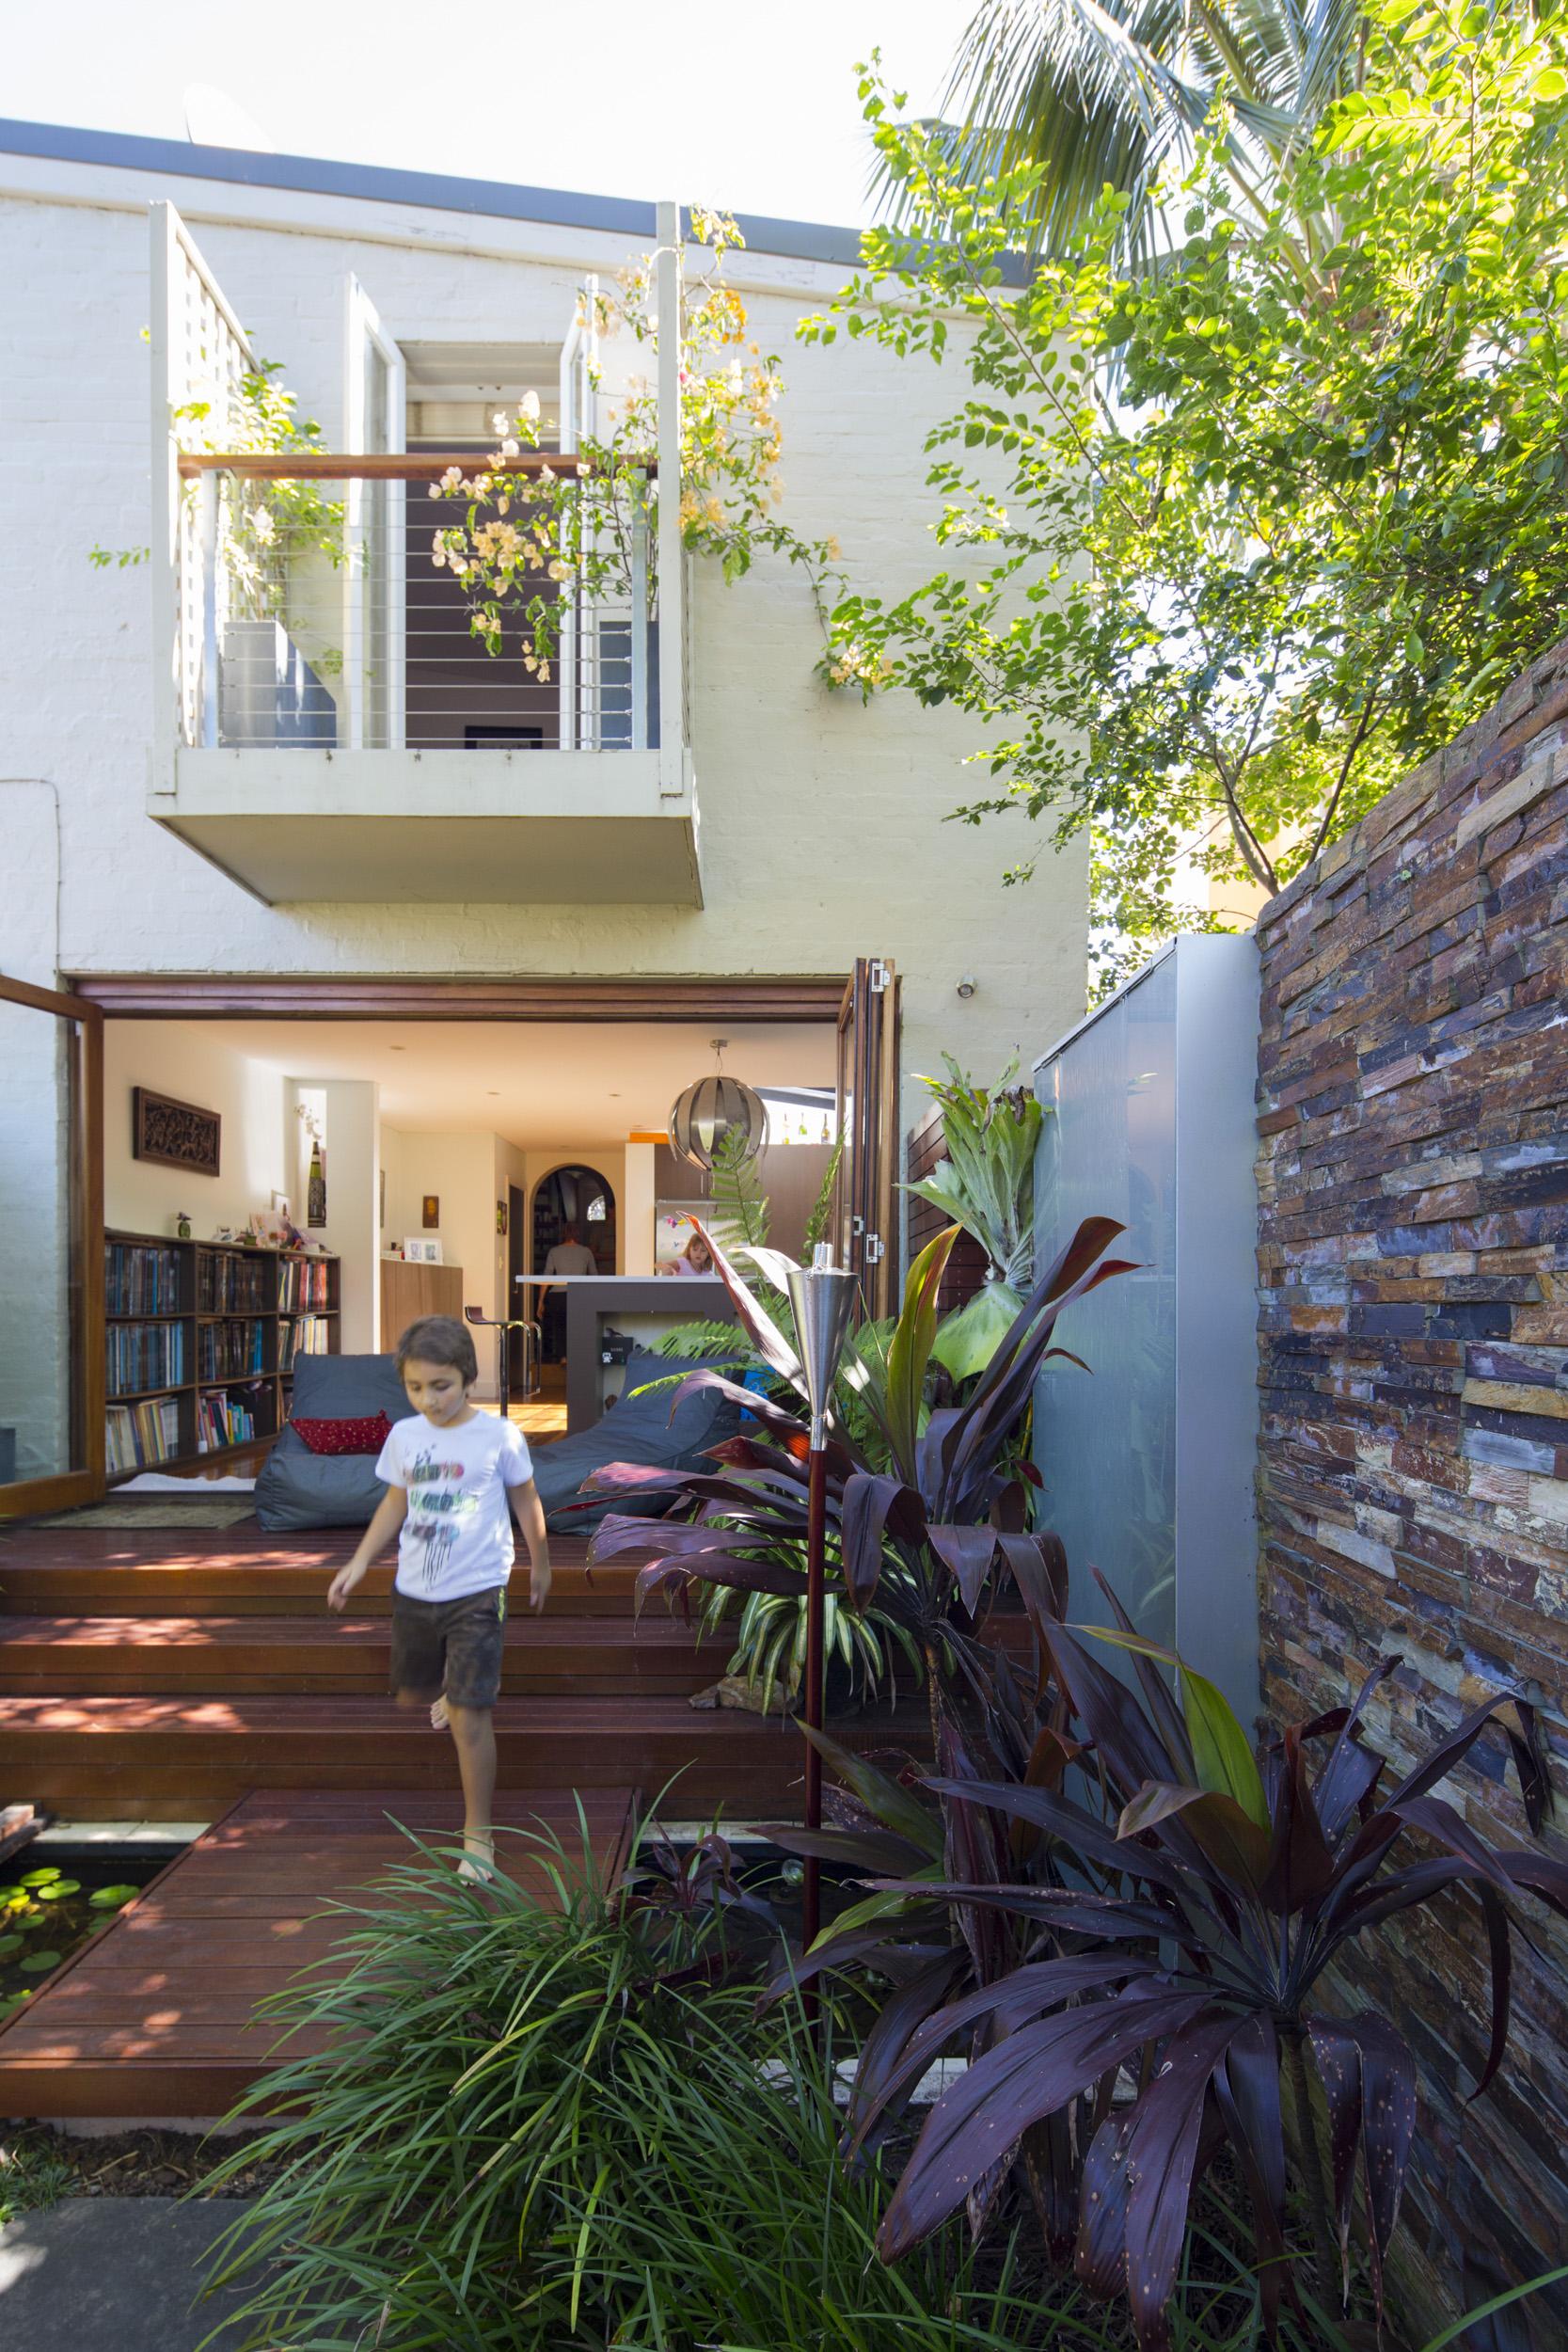 residential_architecture_sydney_australia_14.jpg